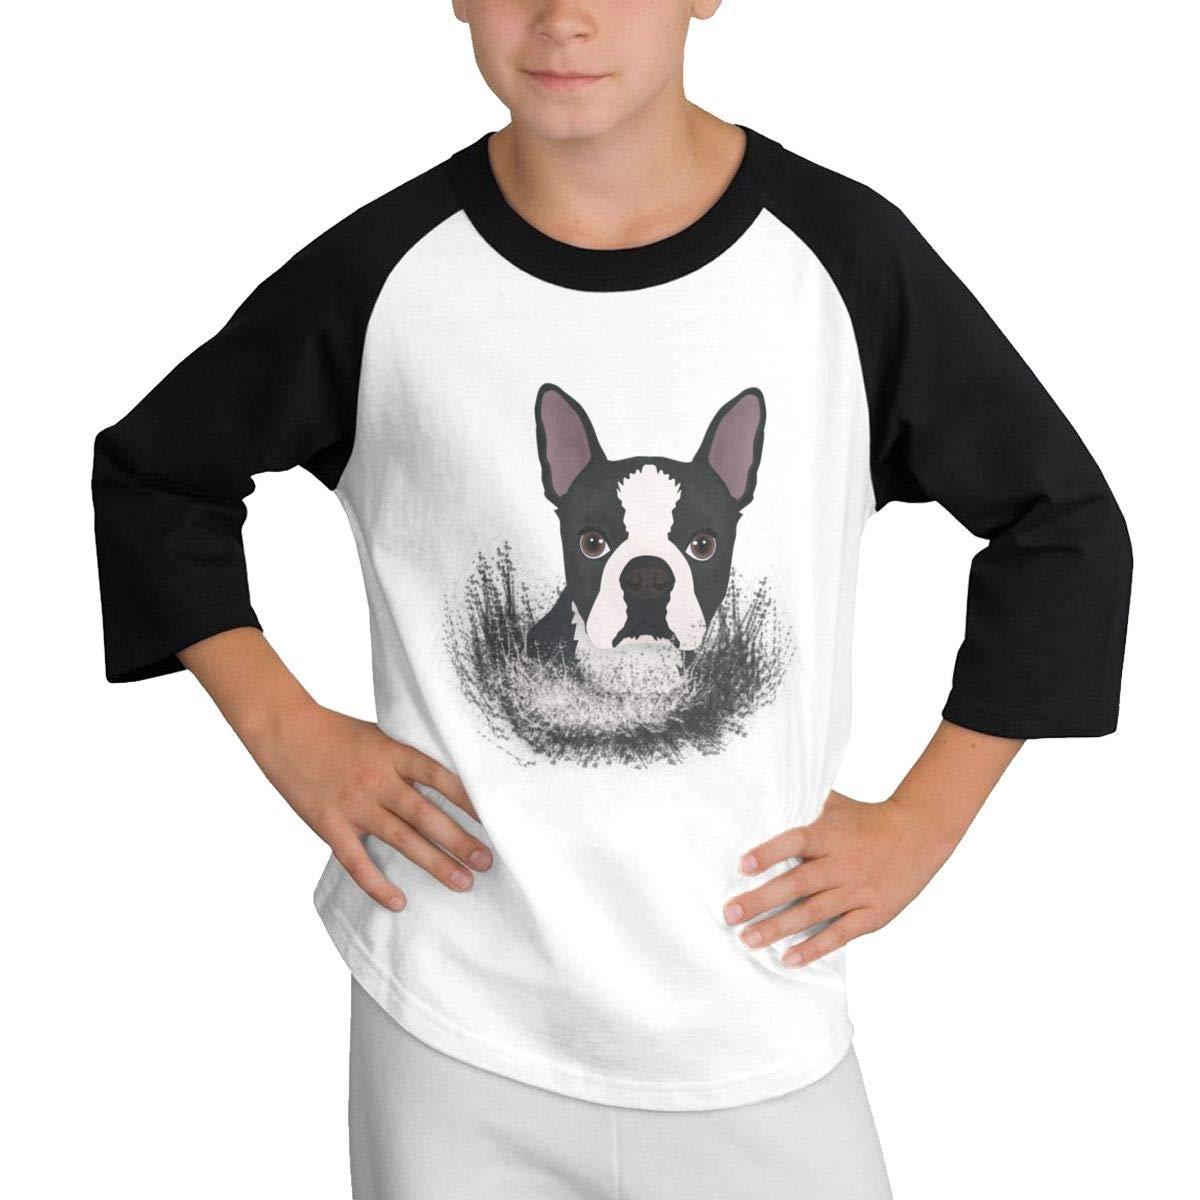 Qiop Nee Puppy Boston Terrier Dog Raglan 3//4 Short-Sleeve Tshirts Youth Girl Boys